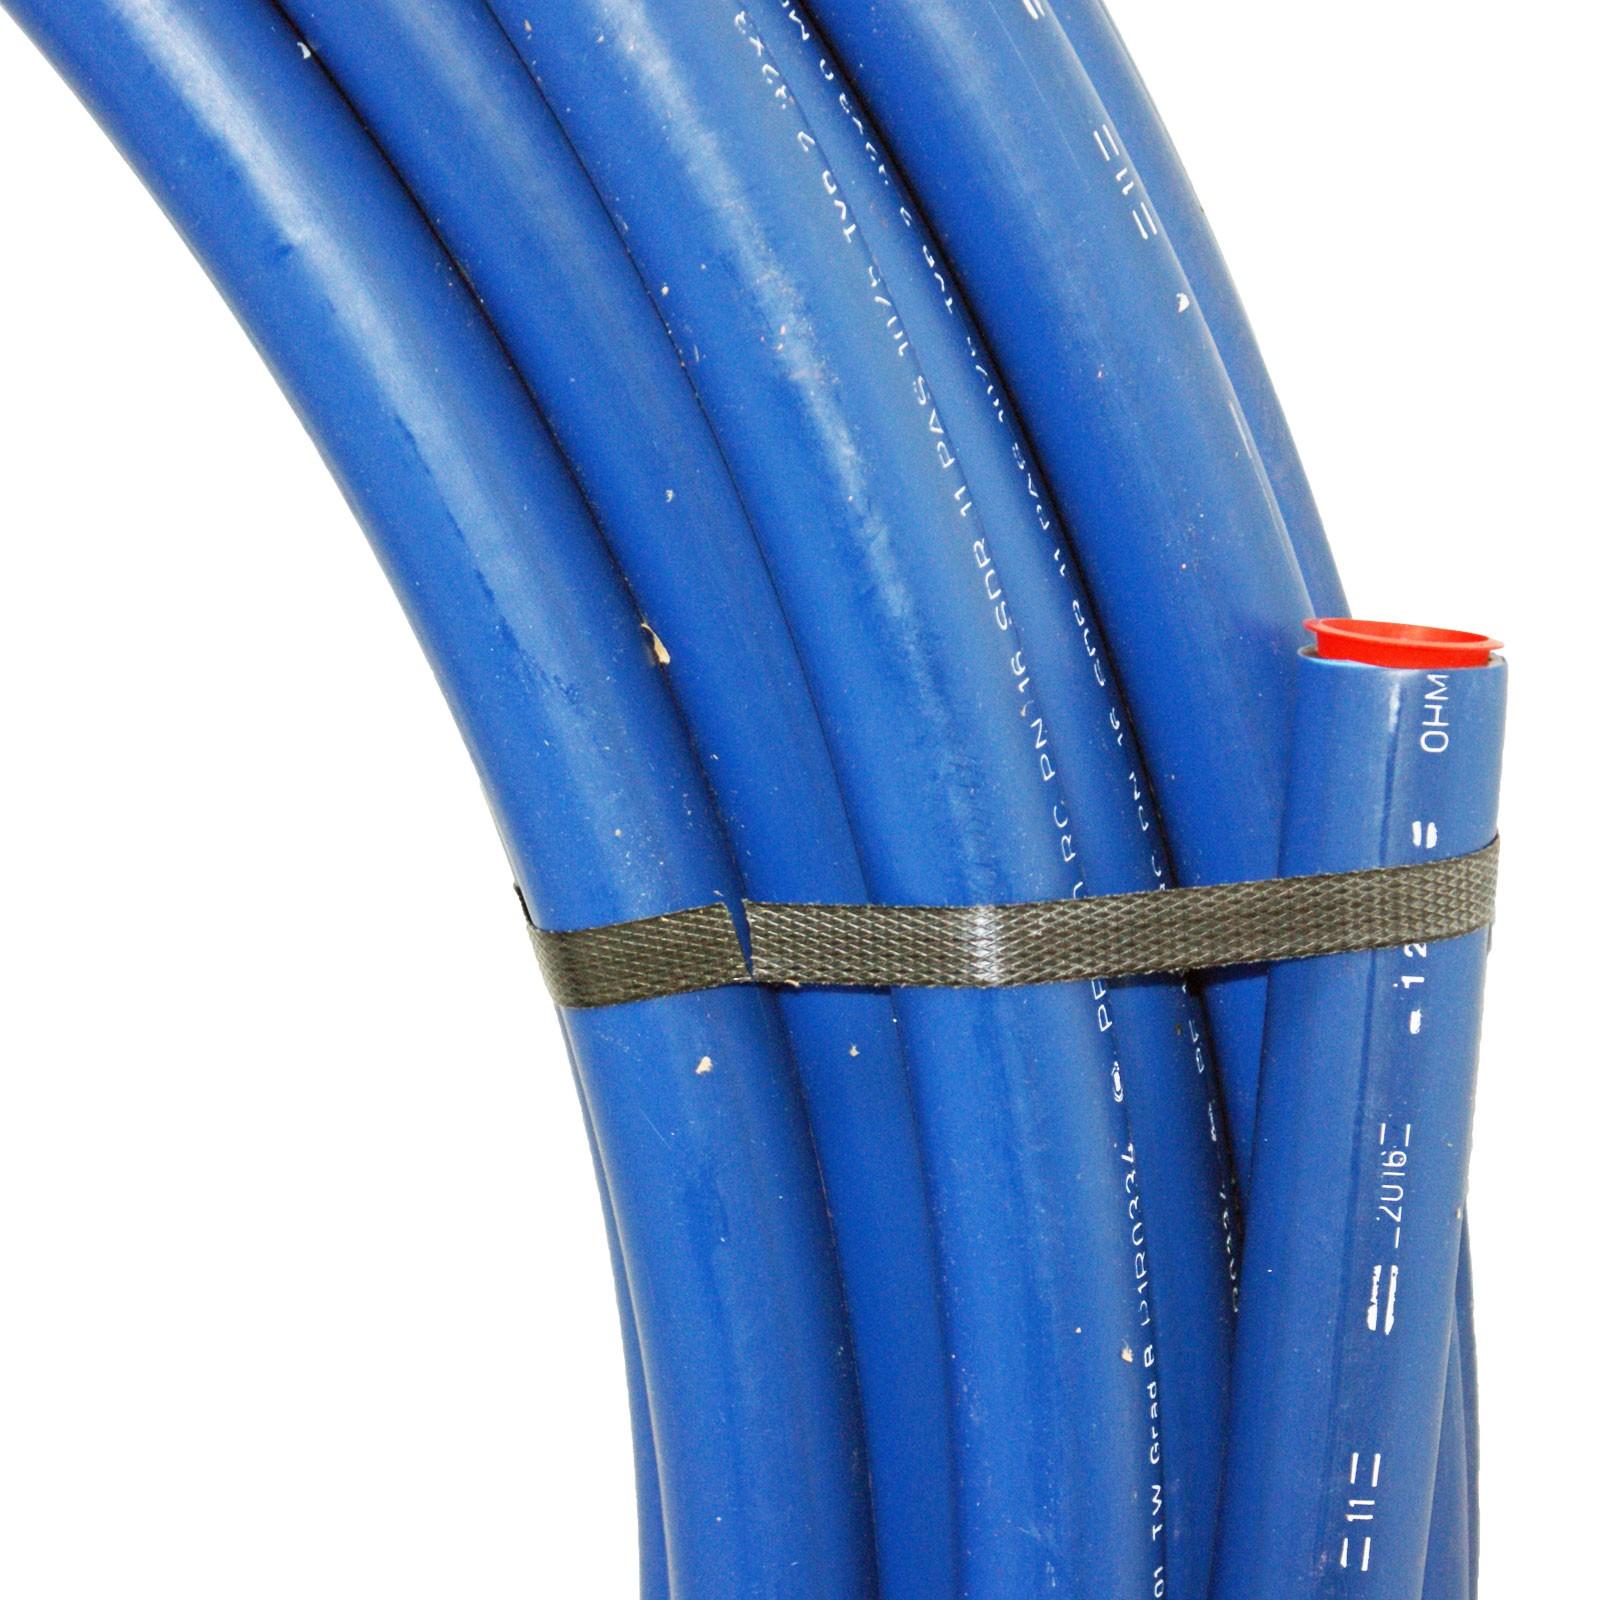 pe rc rohr pe100 pn16 100m 1 1 4 zoll 40mm trinkwasser blau. Black Bedroom Furniture Sets. Home Design Ideas